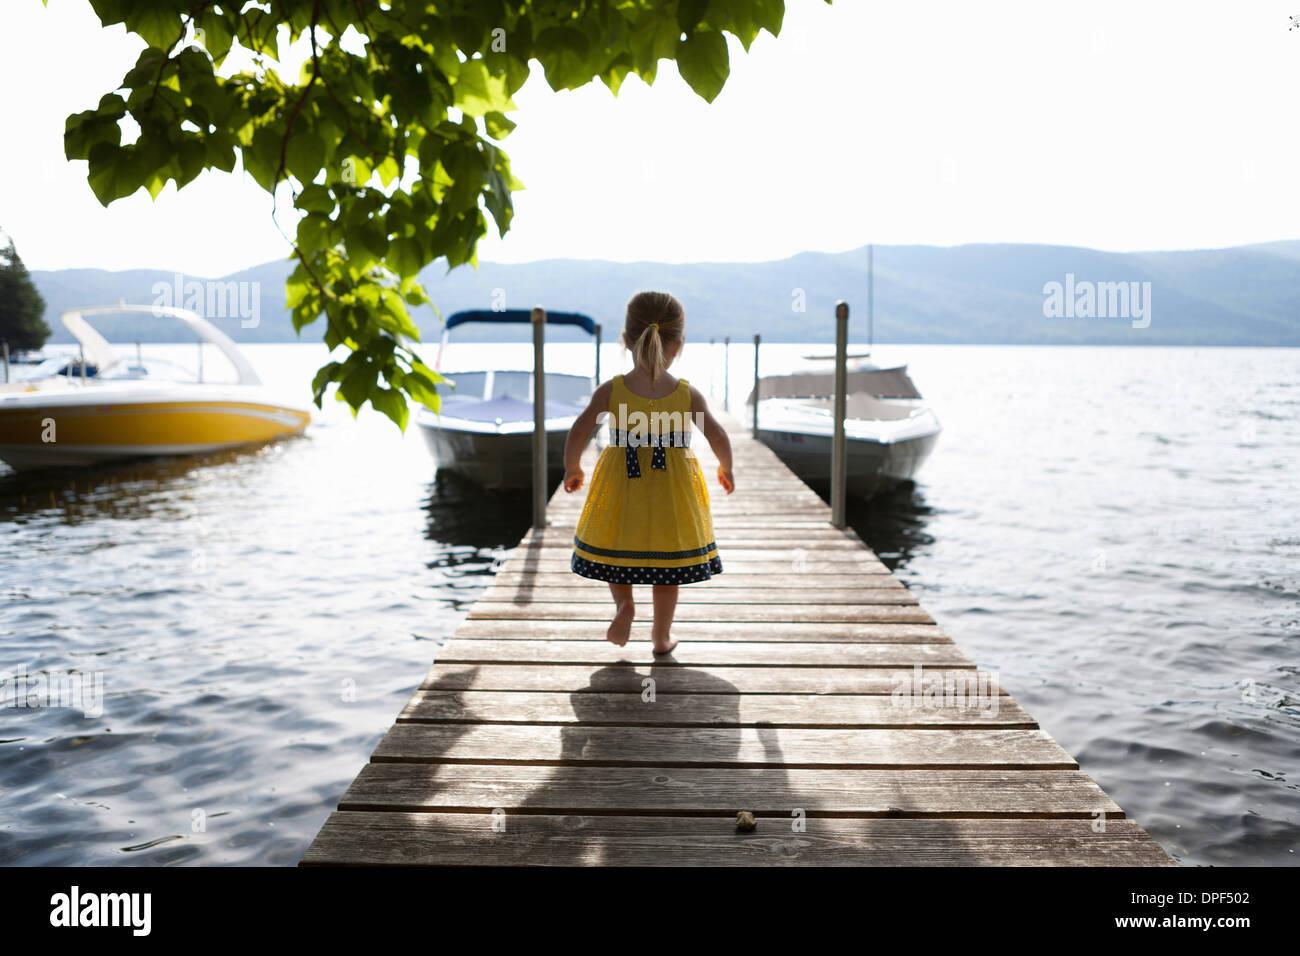 Female toddler explorer pier, Silver Bay, New York, USA Photo Stock